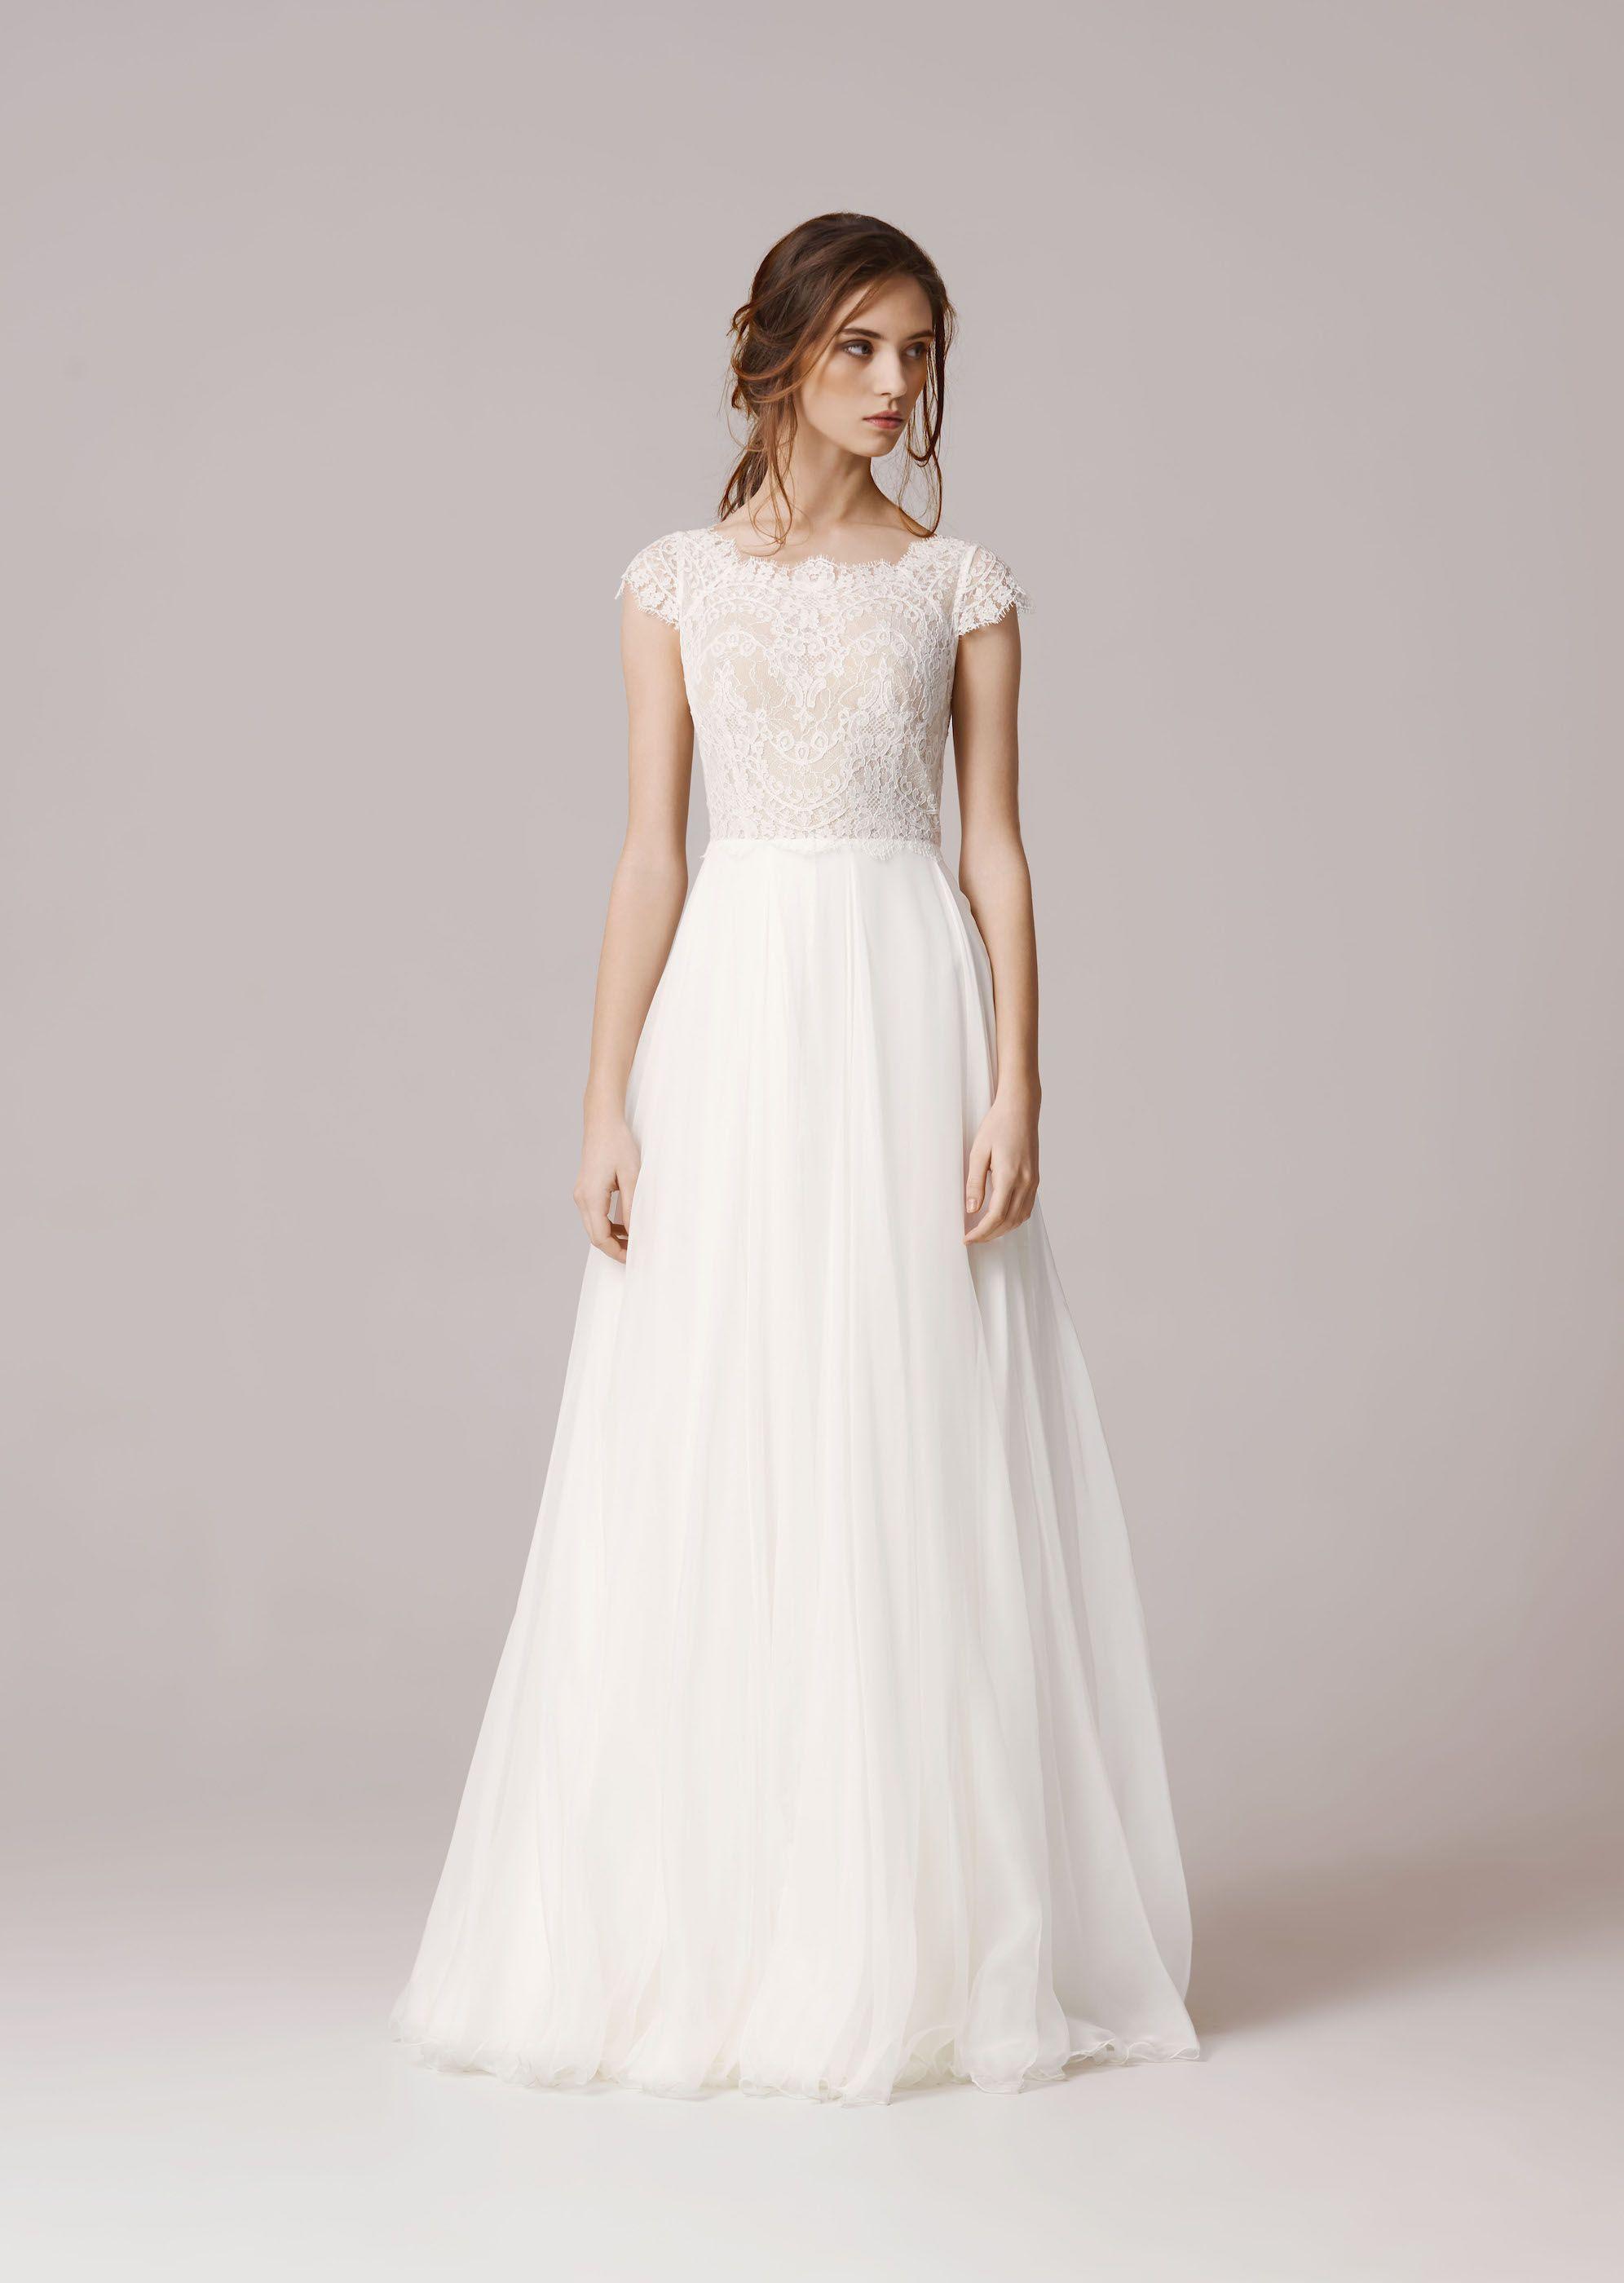 Dans les baskets de lamariée | Wedding dress, Wedding and Robe